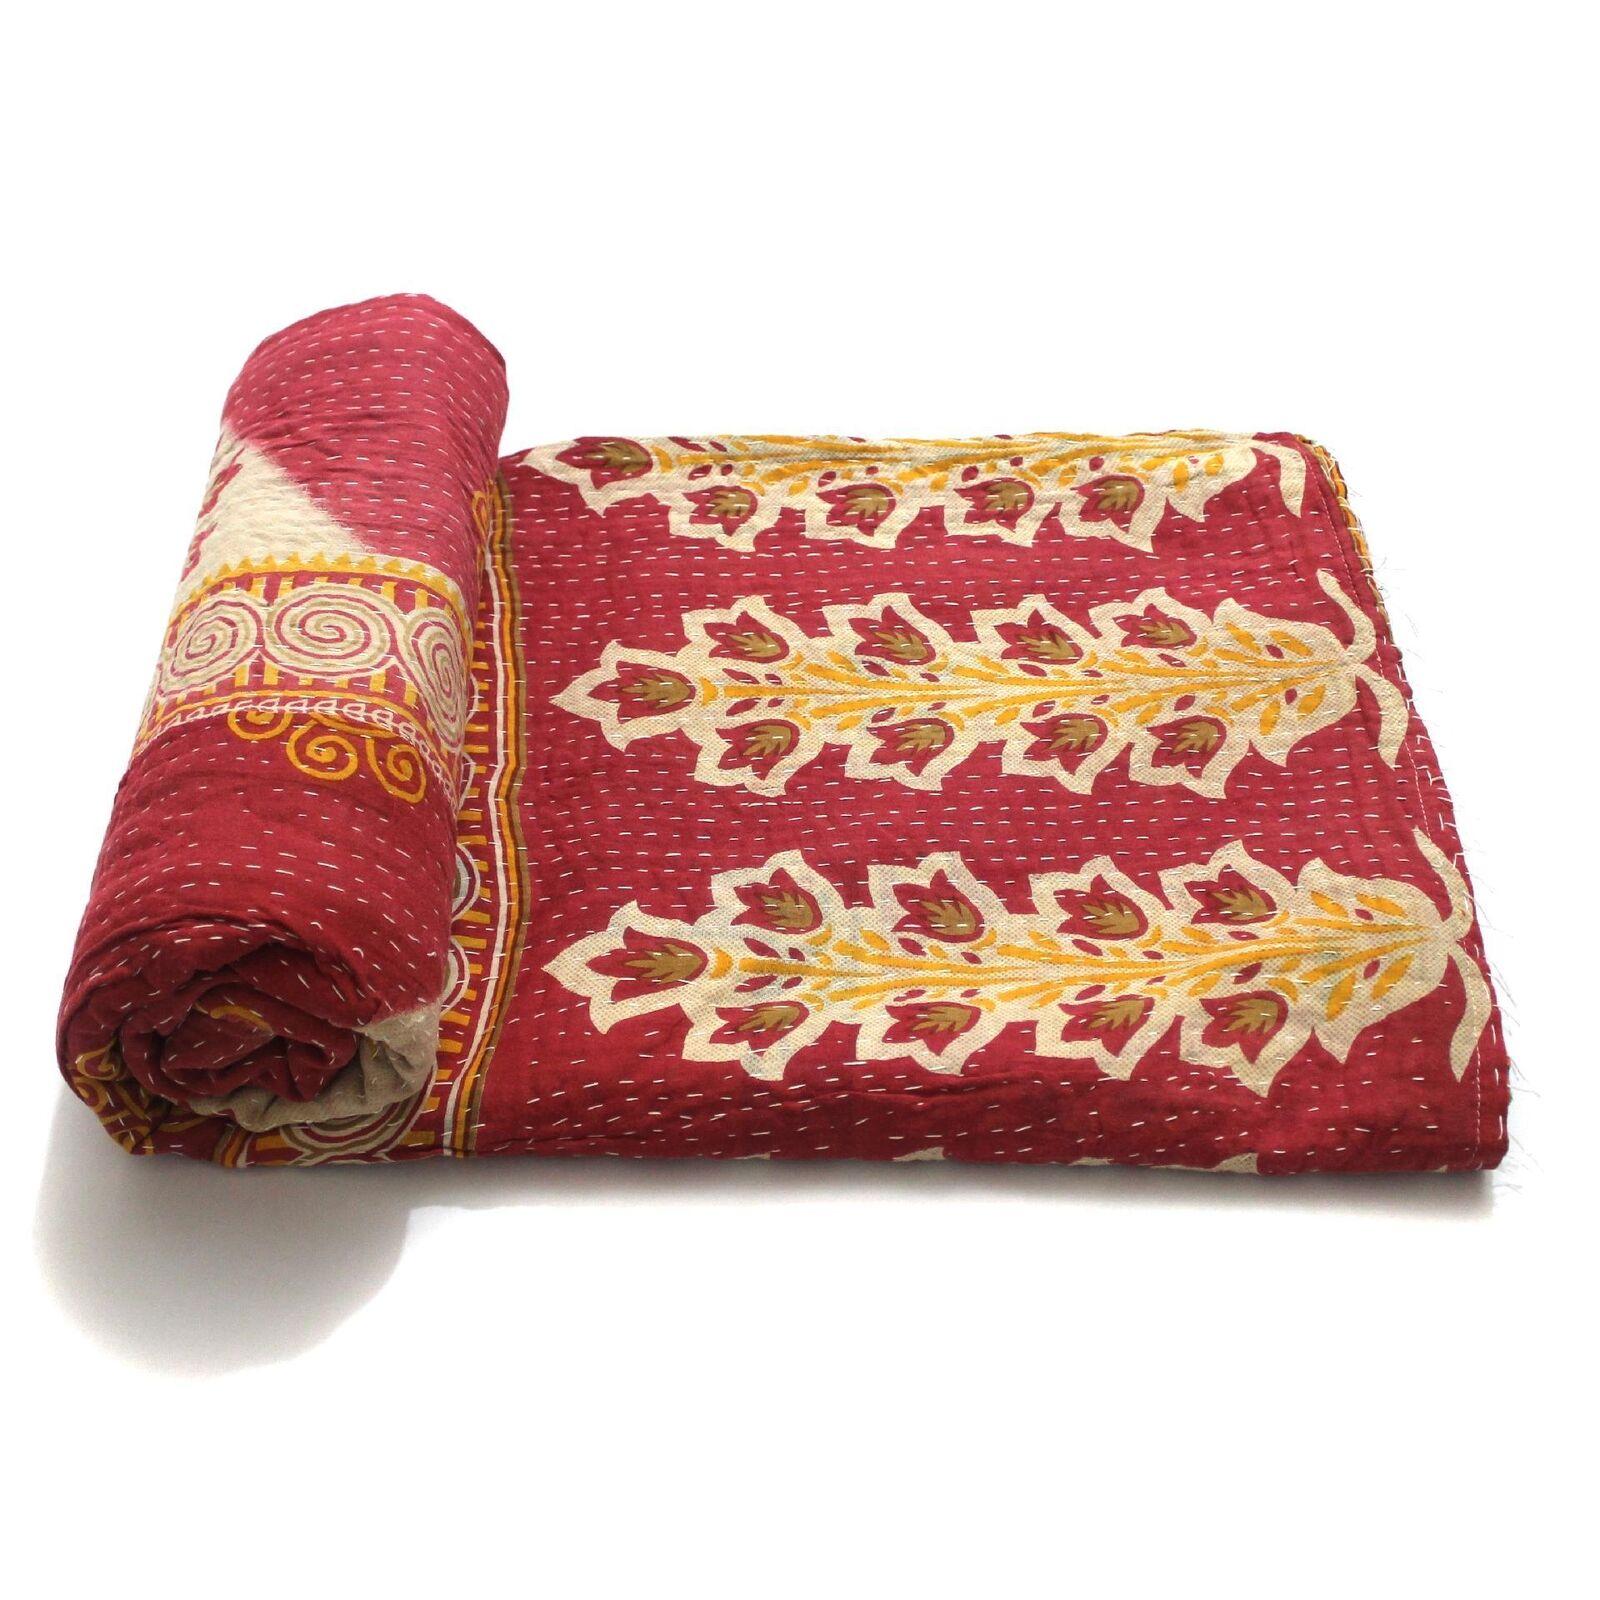 Vintage Quilt Indian Handmade Organic Cotton Bedspread Comforter Bedding Throw